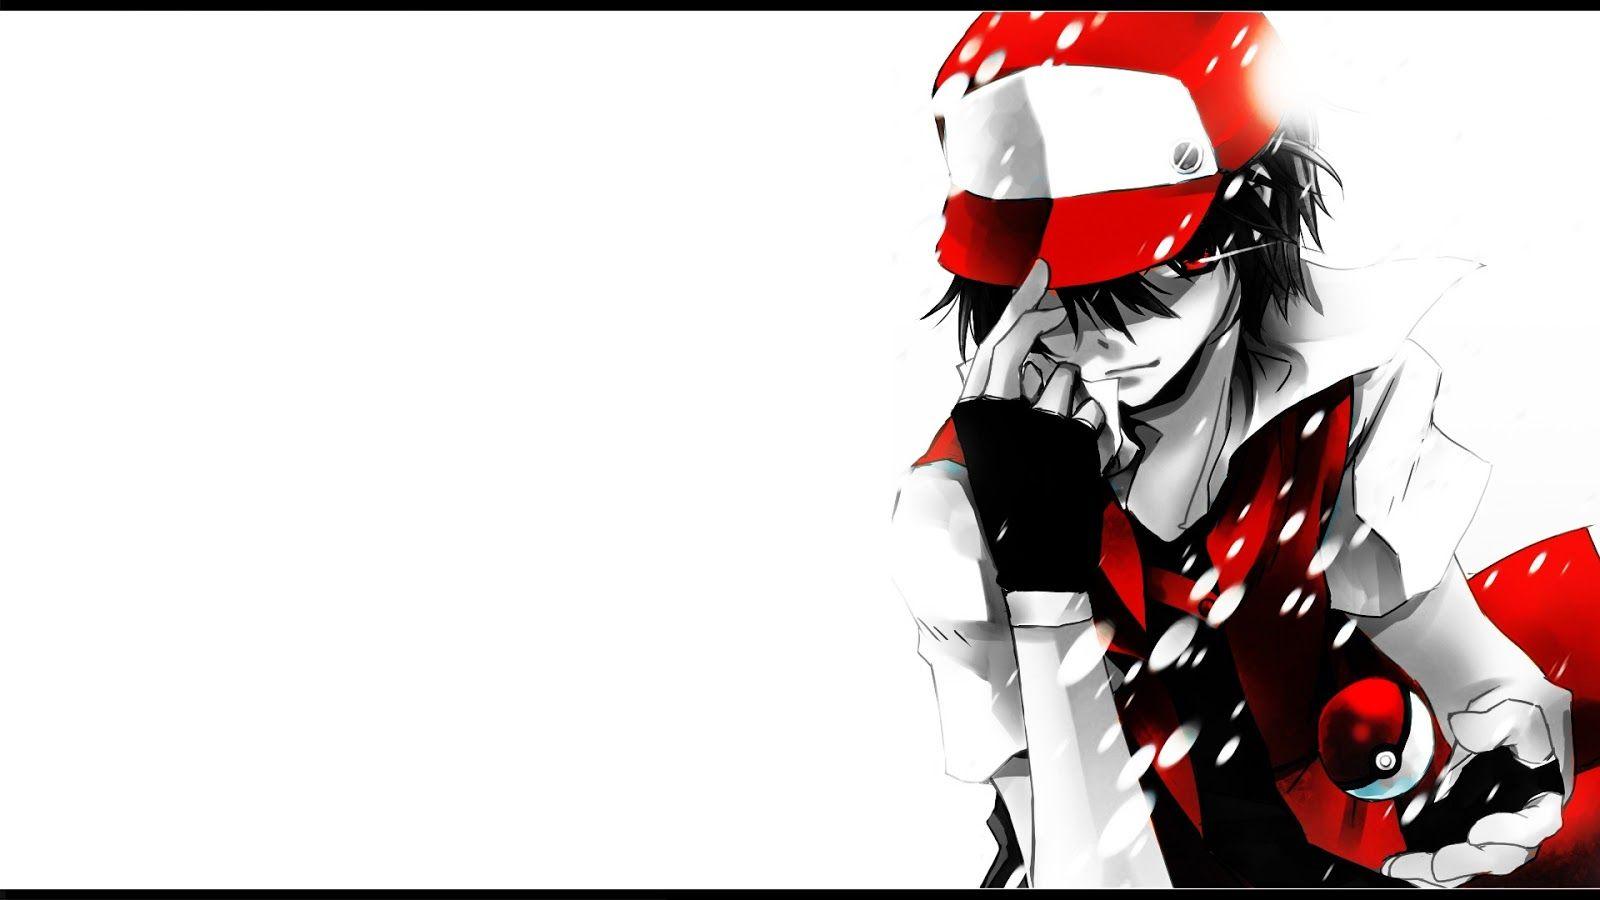 Pokemon Anime Boy Wallpaper Hd Manga Anime So Cute Trop Mignon